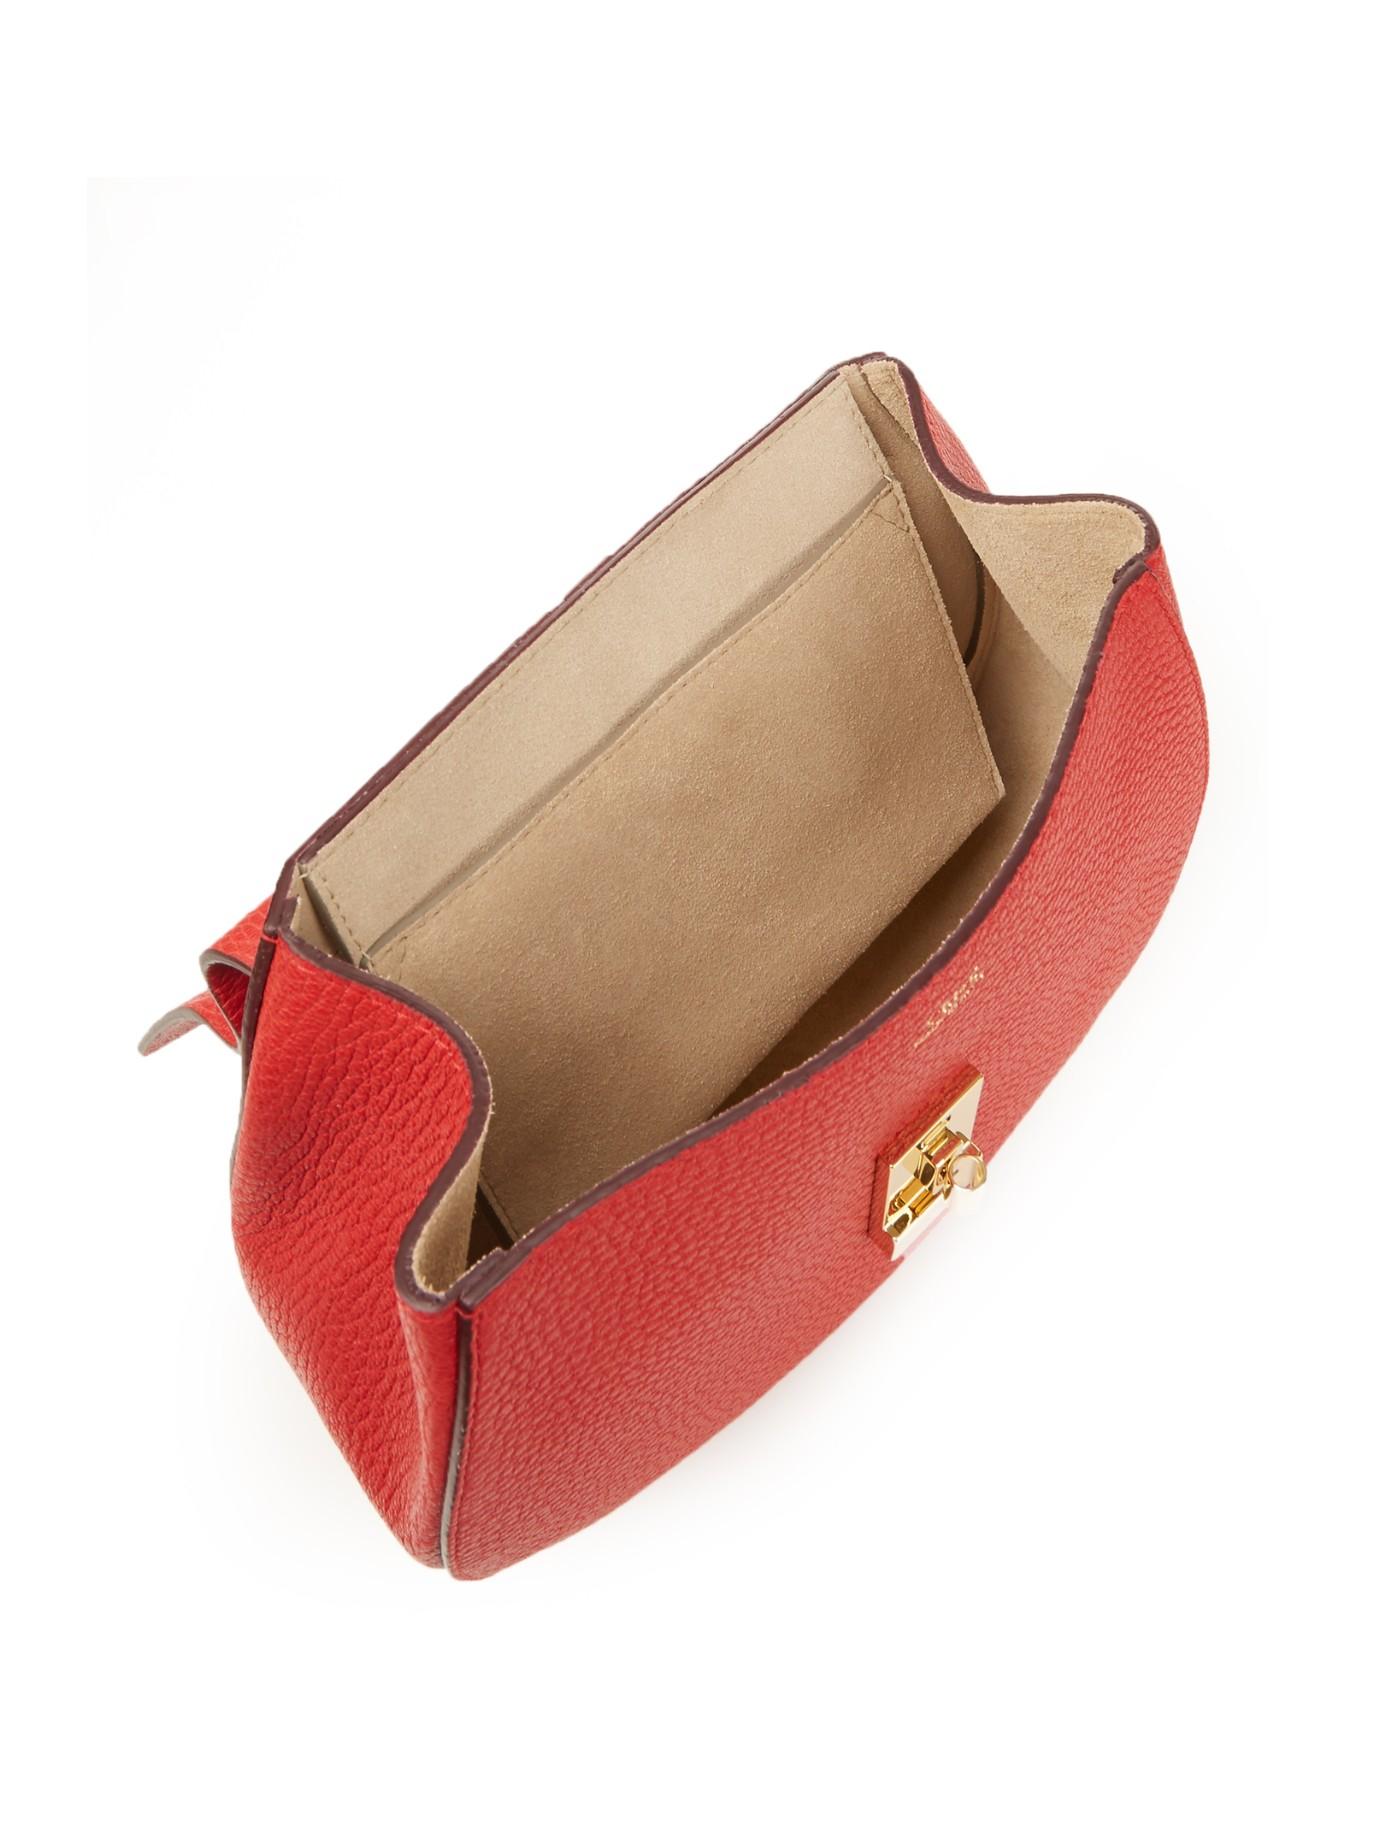 chloe drew small leather shoulder bag